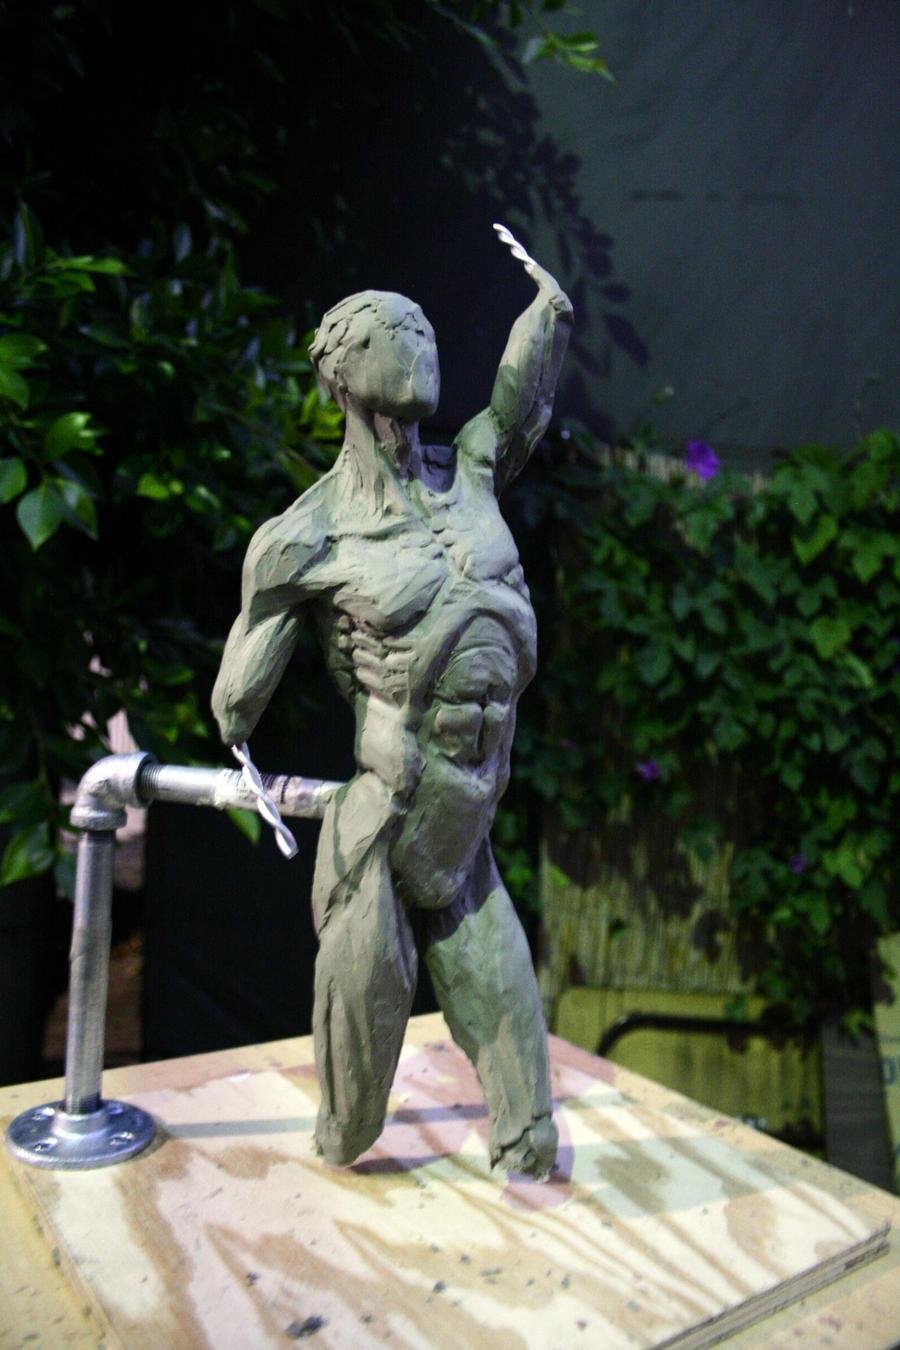 Sculpture: Torso Study by JessicaDru